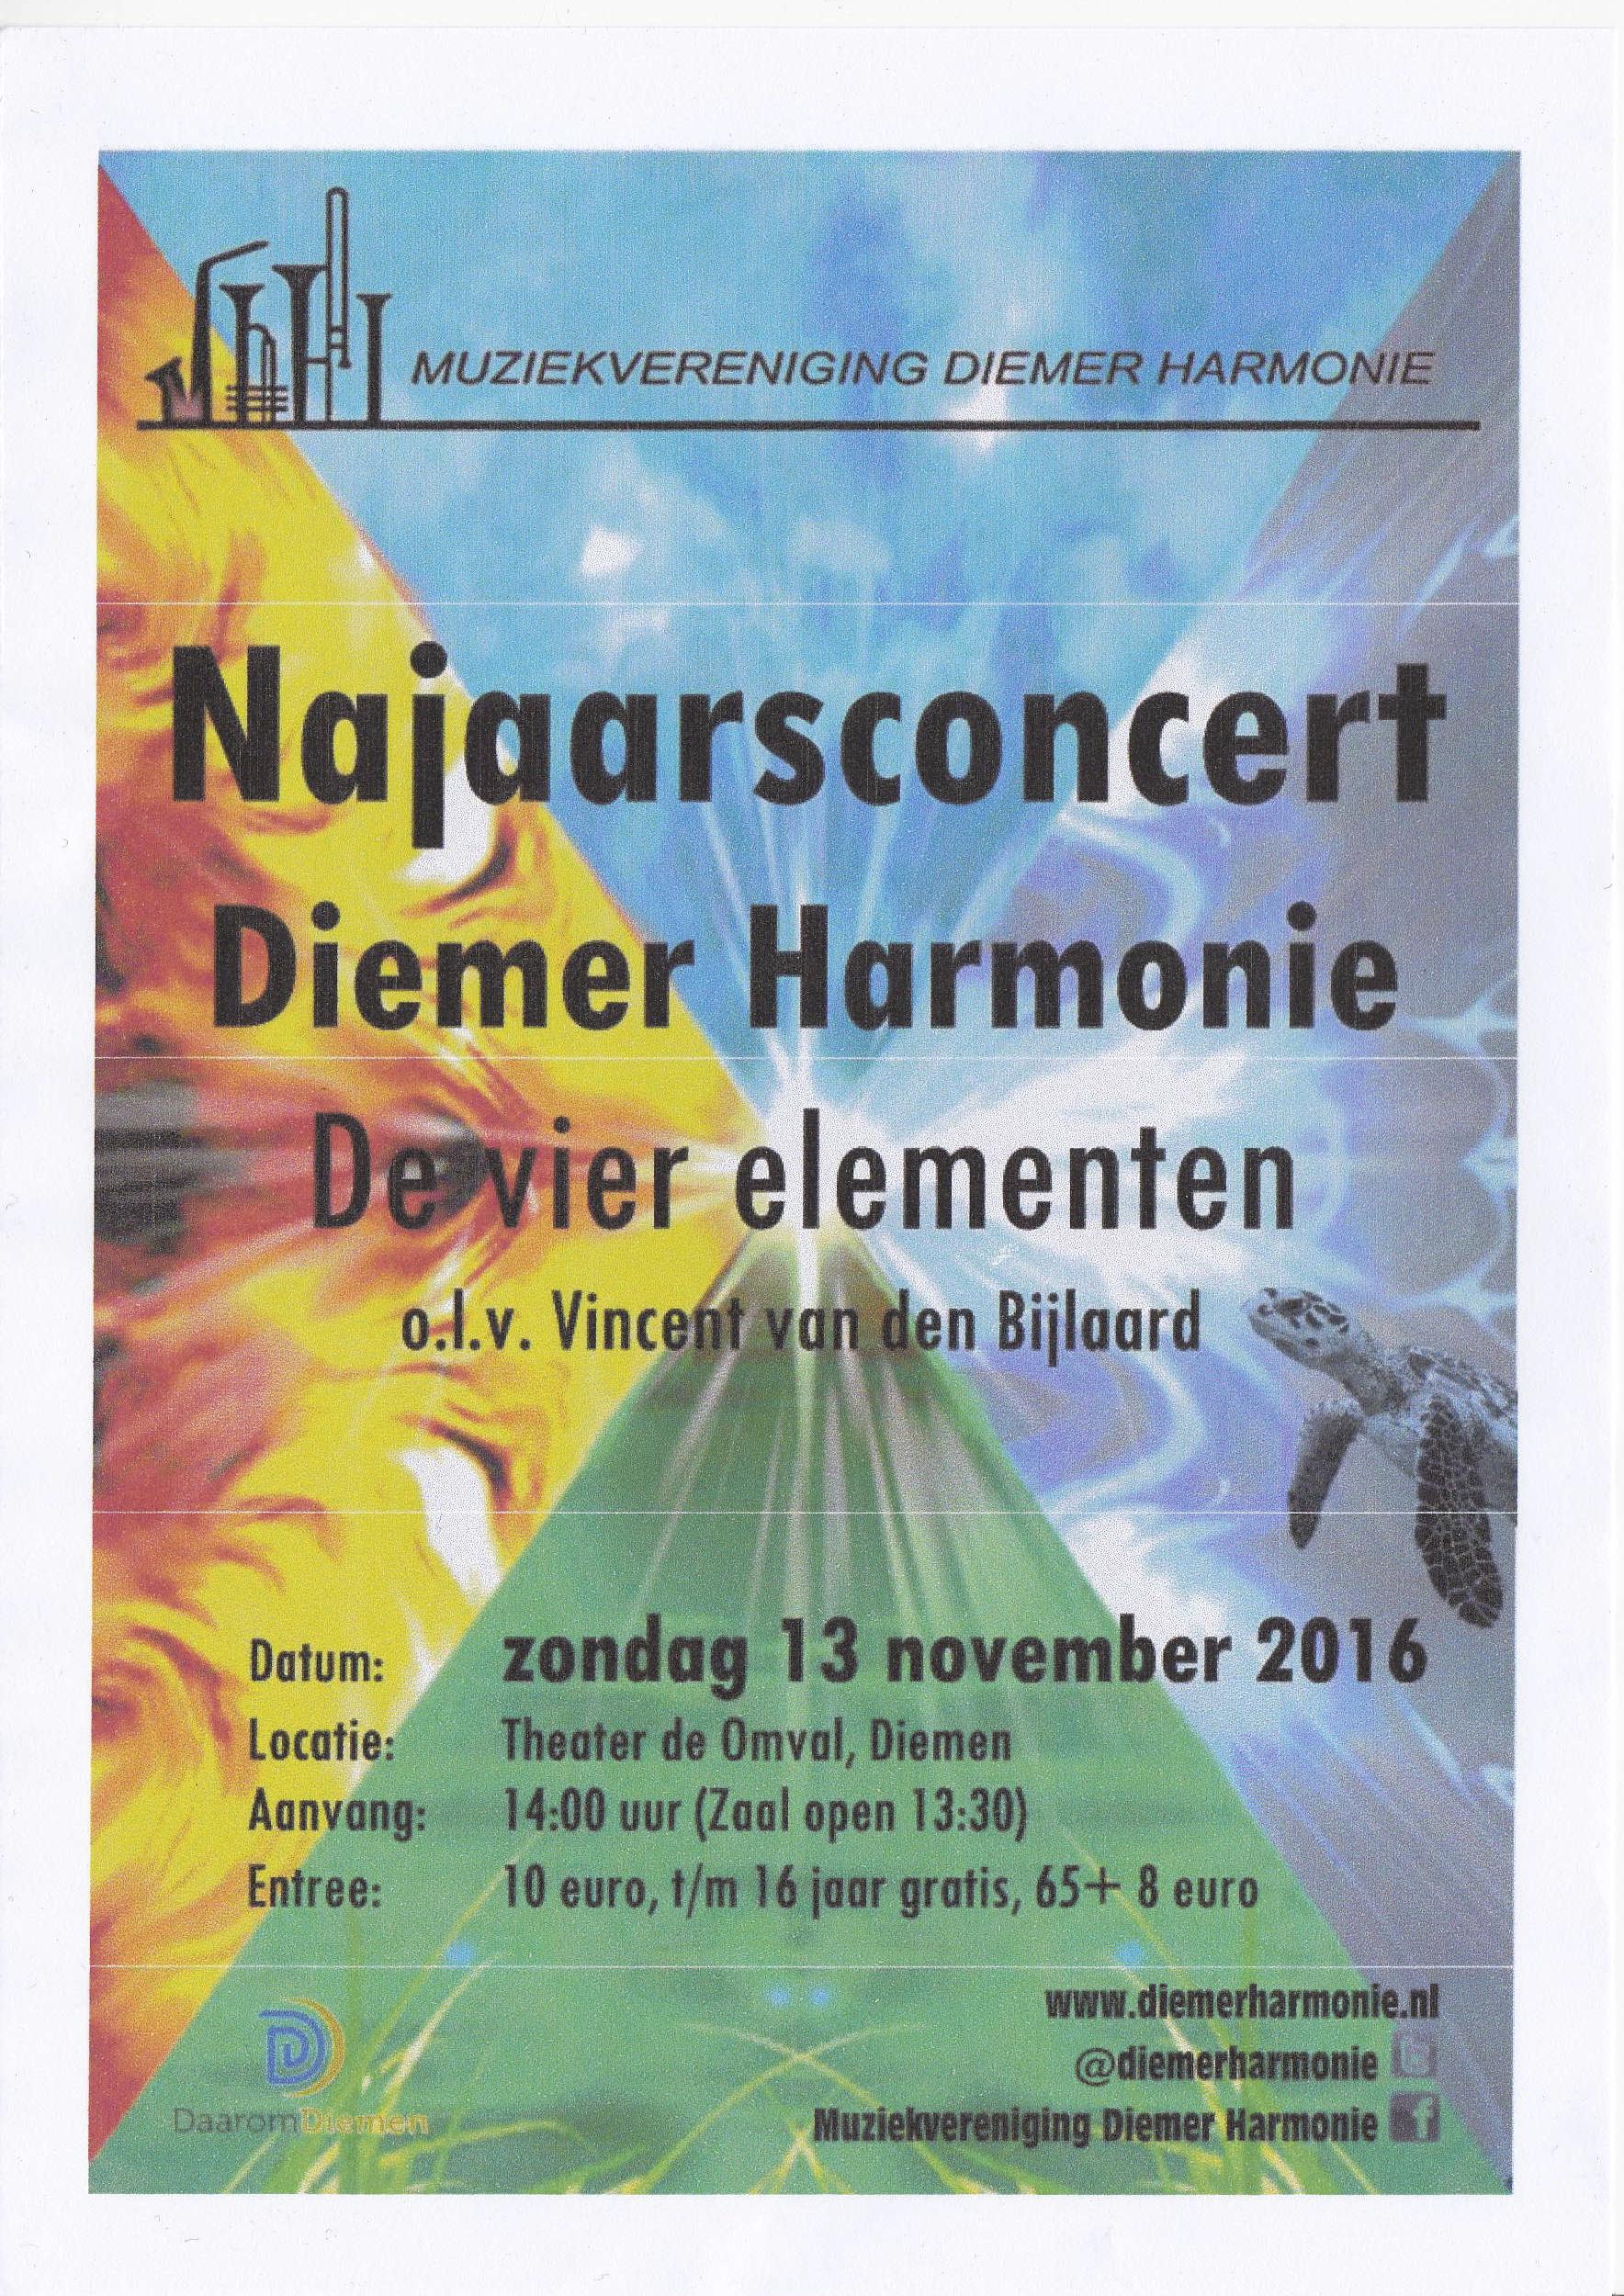 najaarsconcert_diemer_harmonie